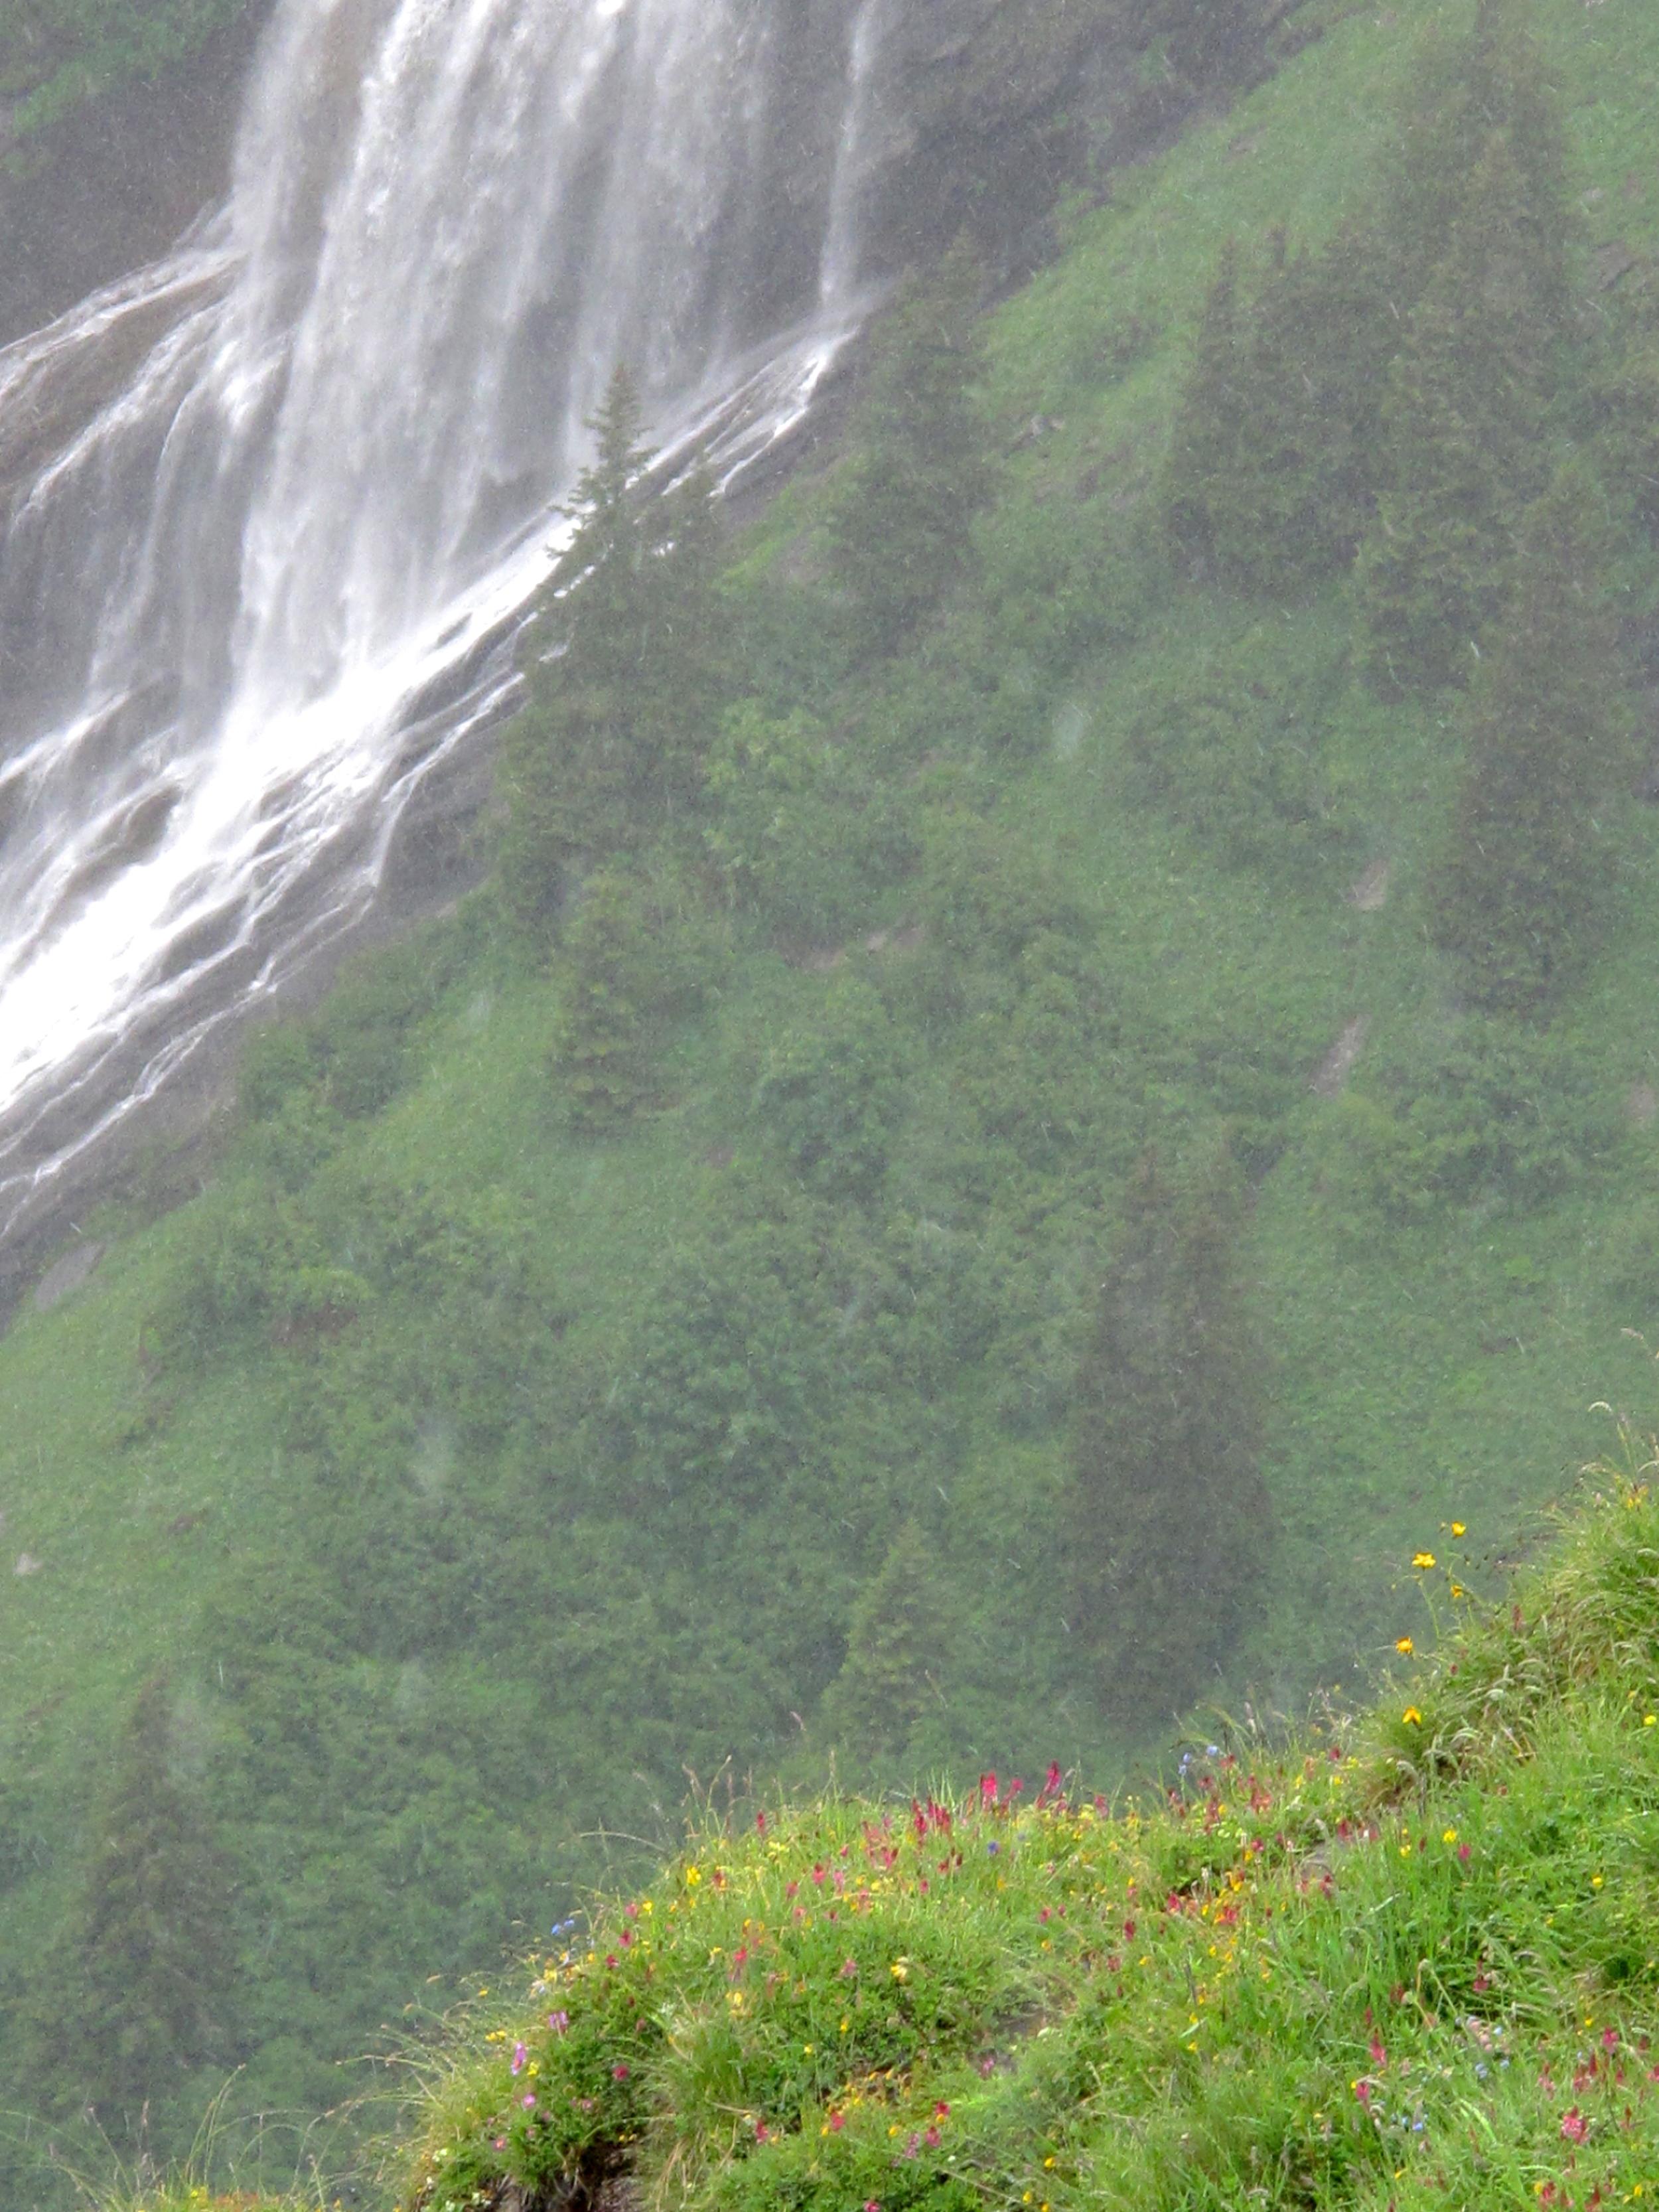 Waterfalls high up in the Swiss Alps near Lauterbrunnen